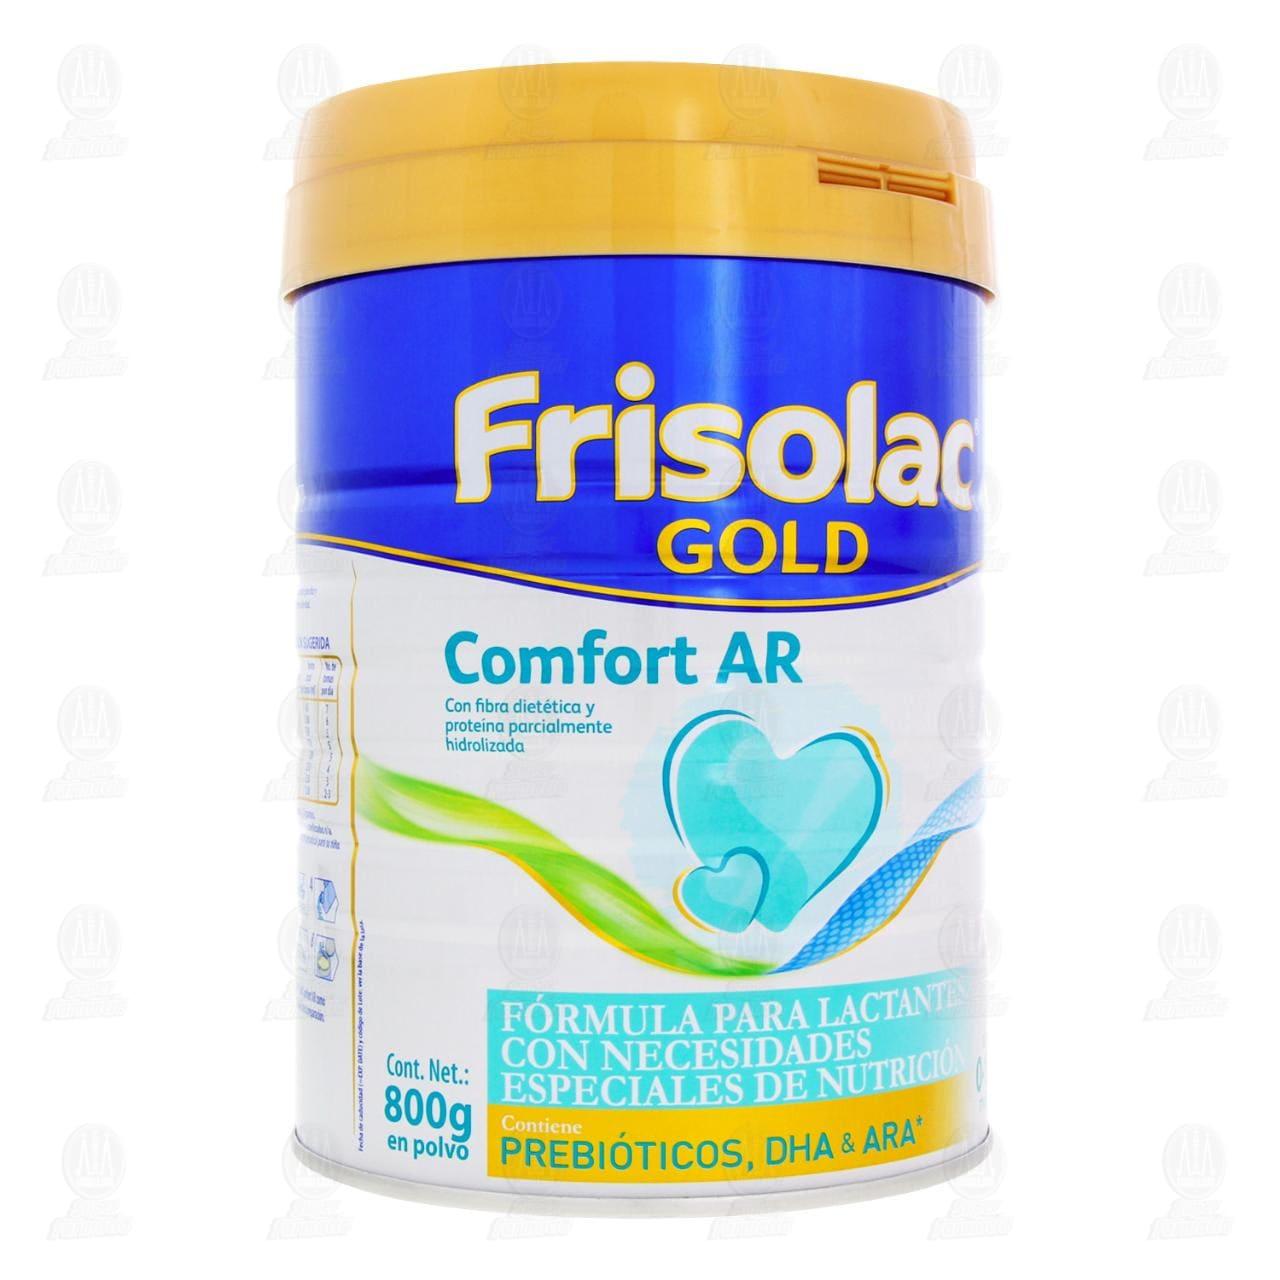 Comprar Fórmula Infantil Frisolac Gold Comfort en Polvo (Edad 0-12 Meses), 800 gr. en Farmacias Guadalajara